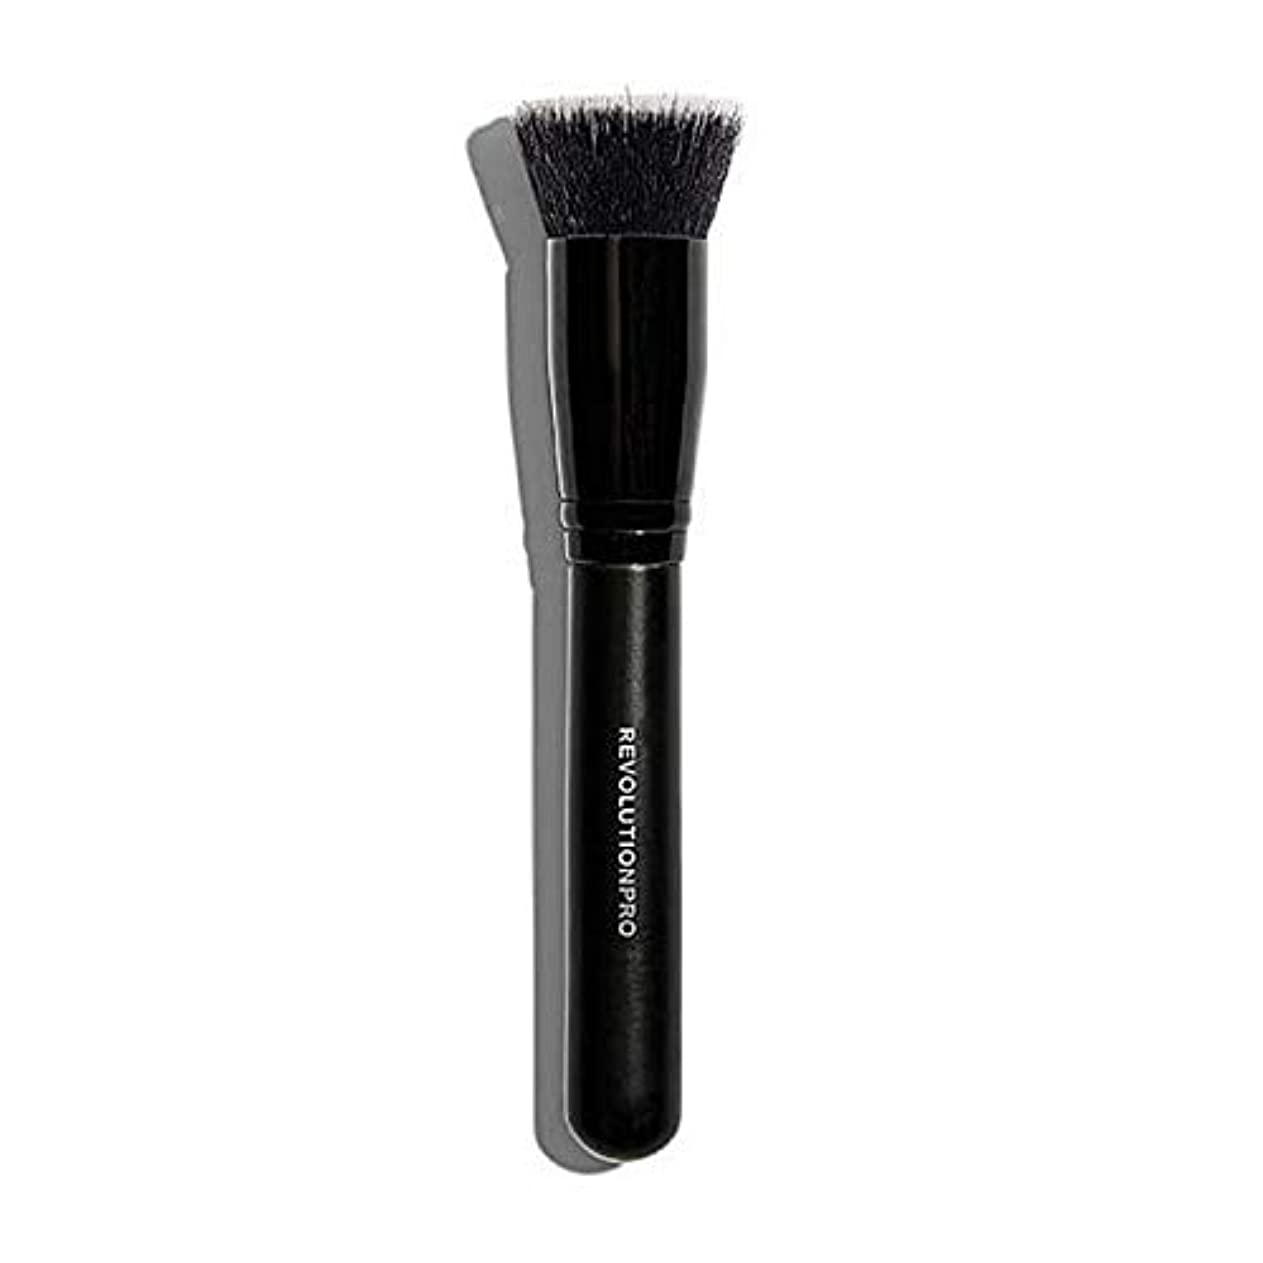 [Revolution ] 革命プロの液滴の基礎化粧ブラシ - Revolution Pro Liquid Drop Foundation Makeup Brush [並行輸入品]